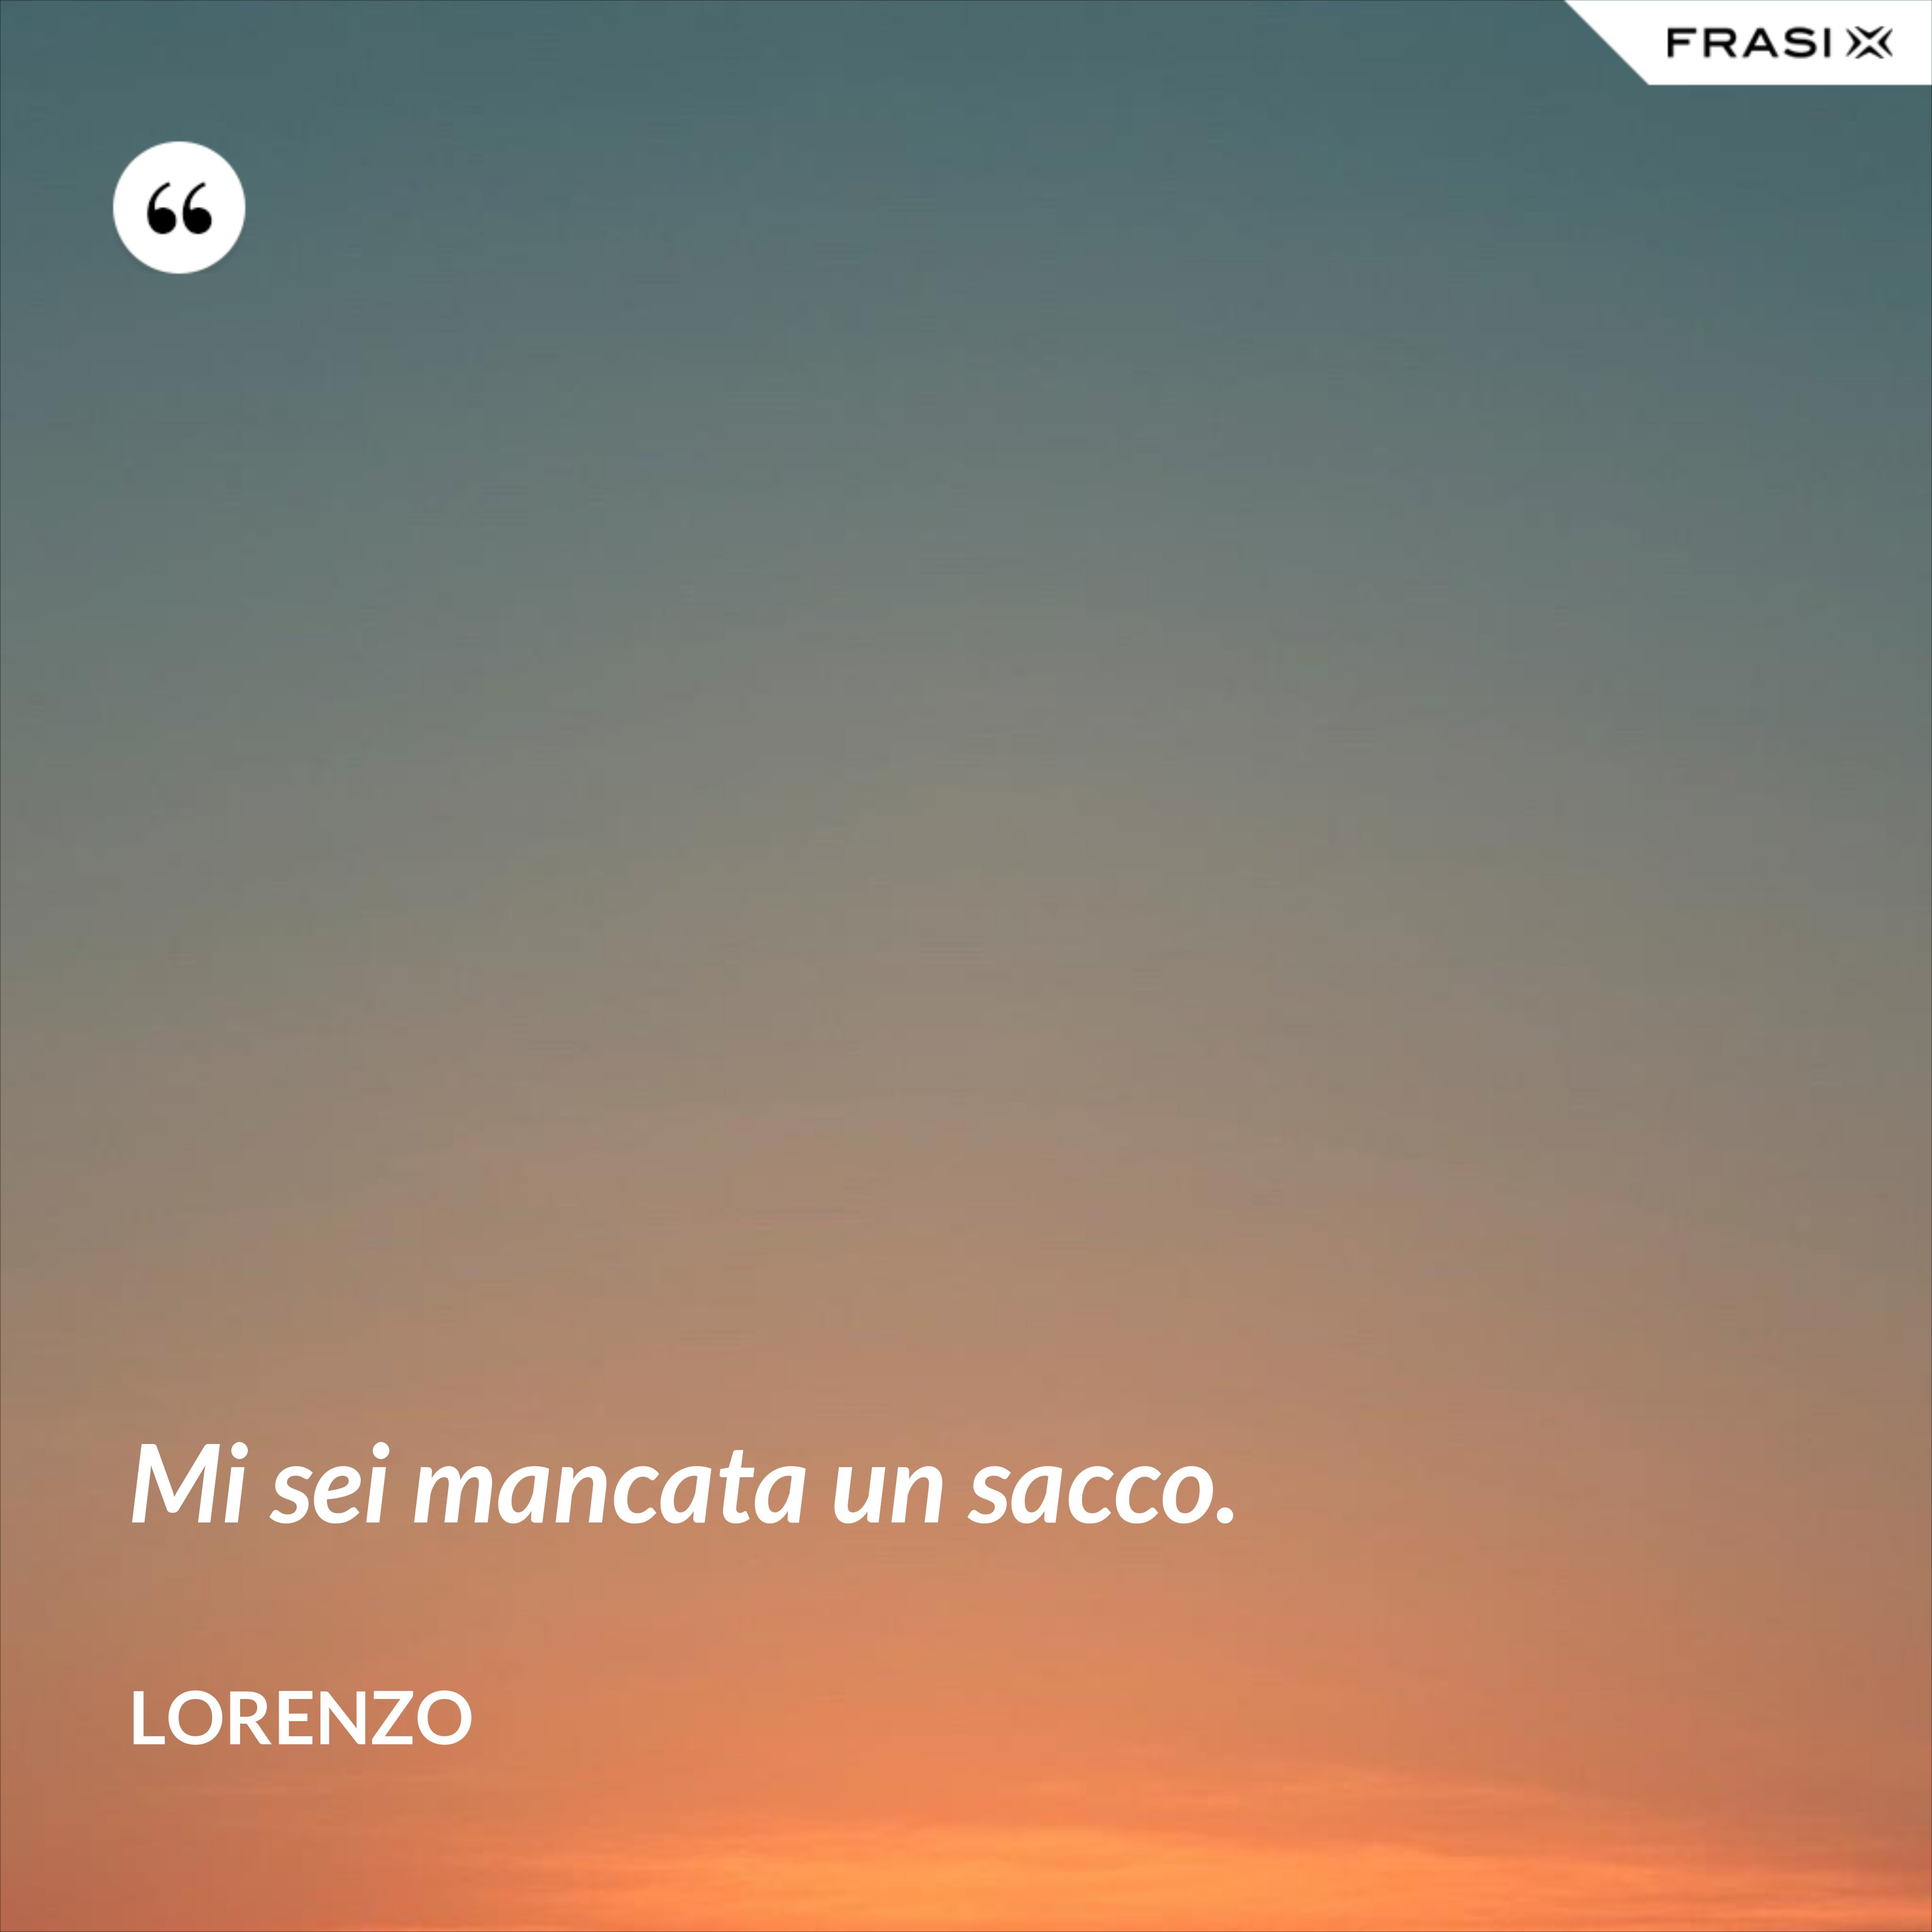 Mi sei mancata un sacco. - Lorenzo